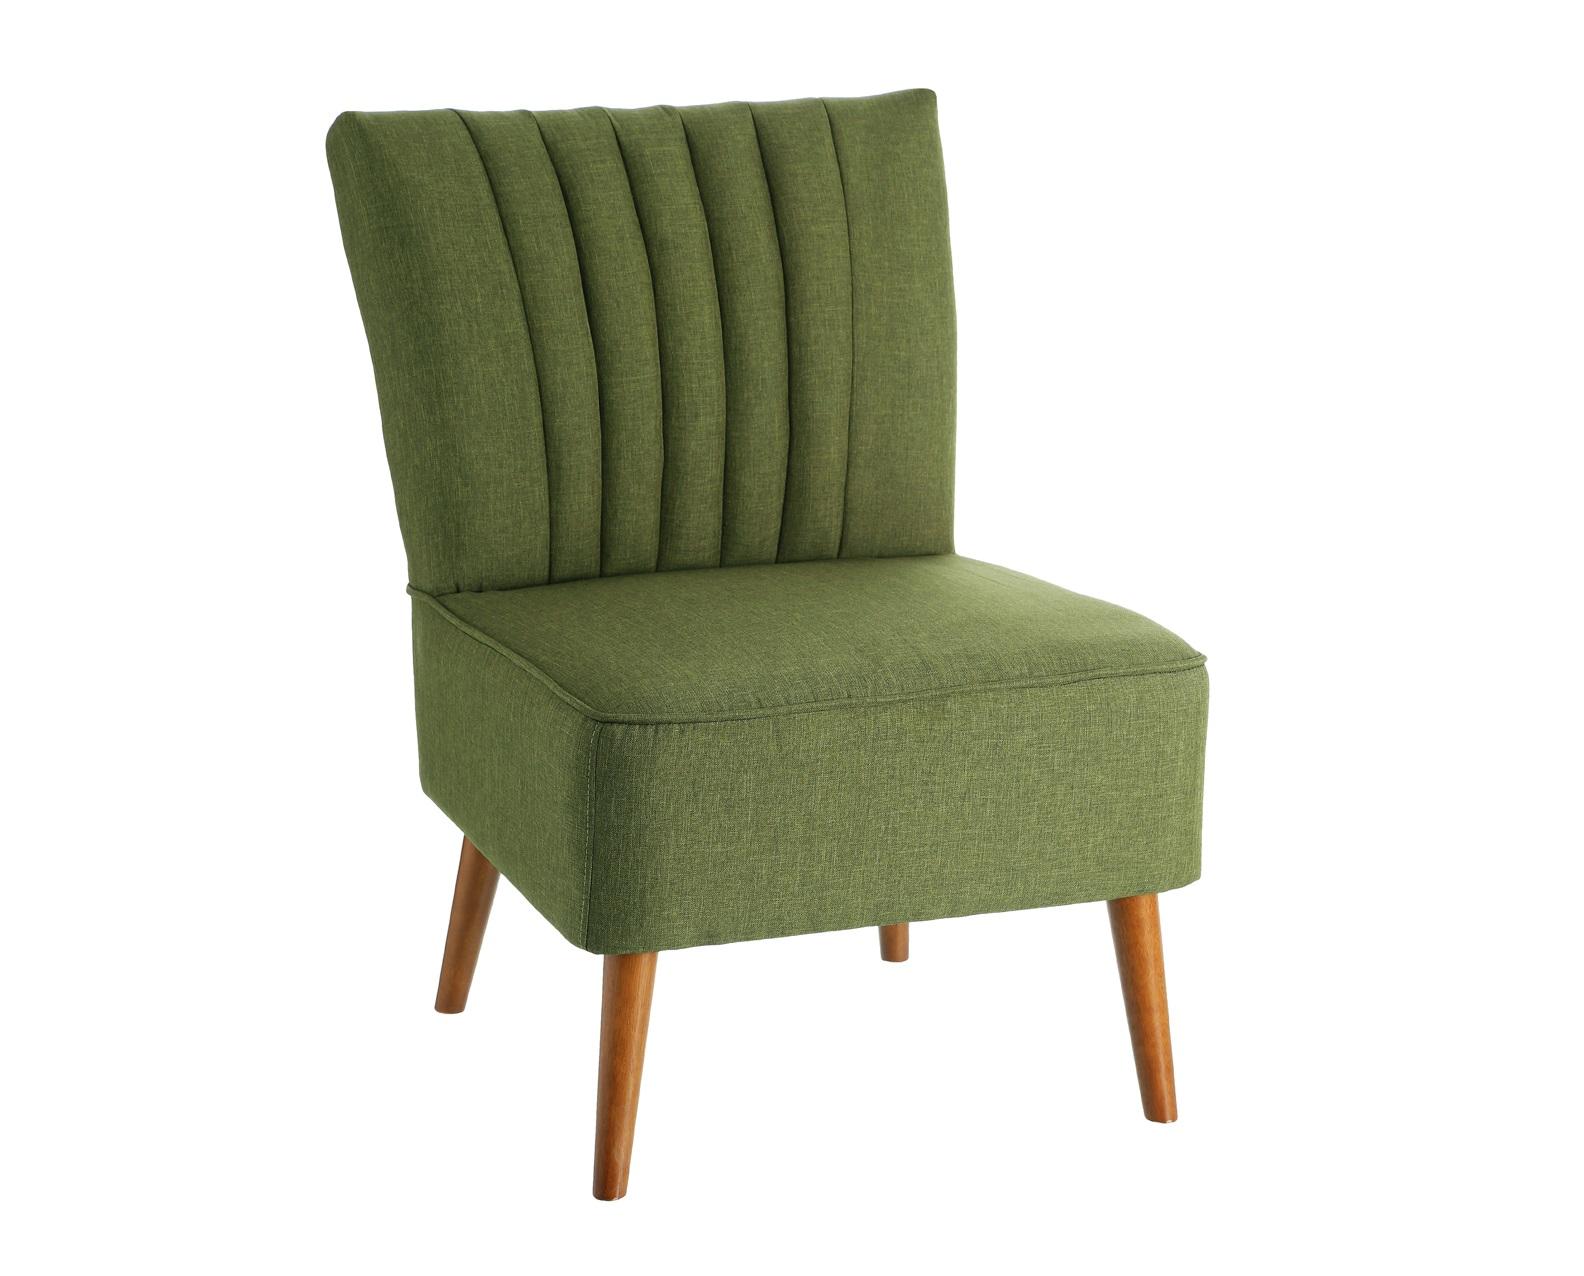 Кресло To4rooms 15441646 от thefurnish